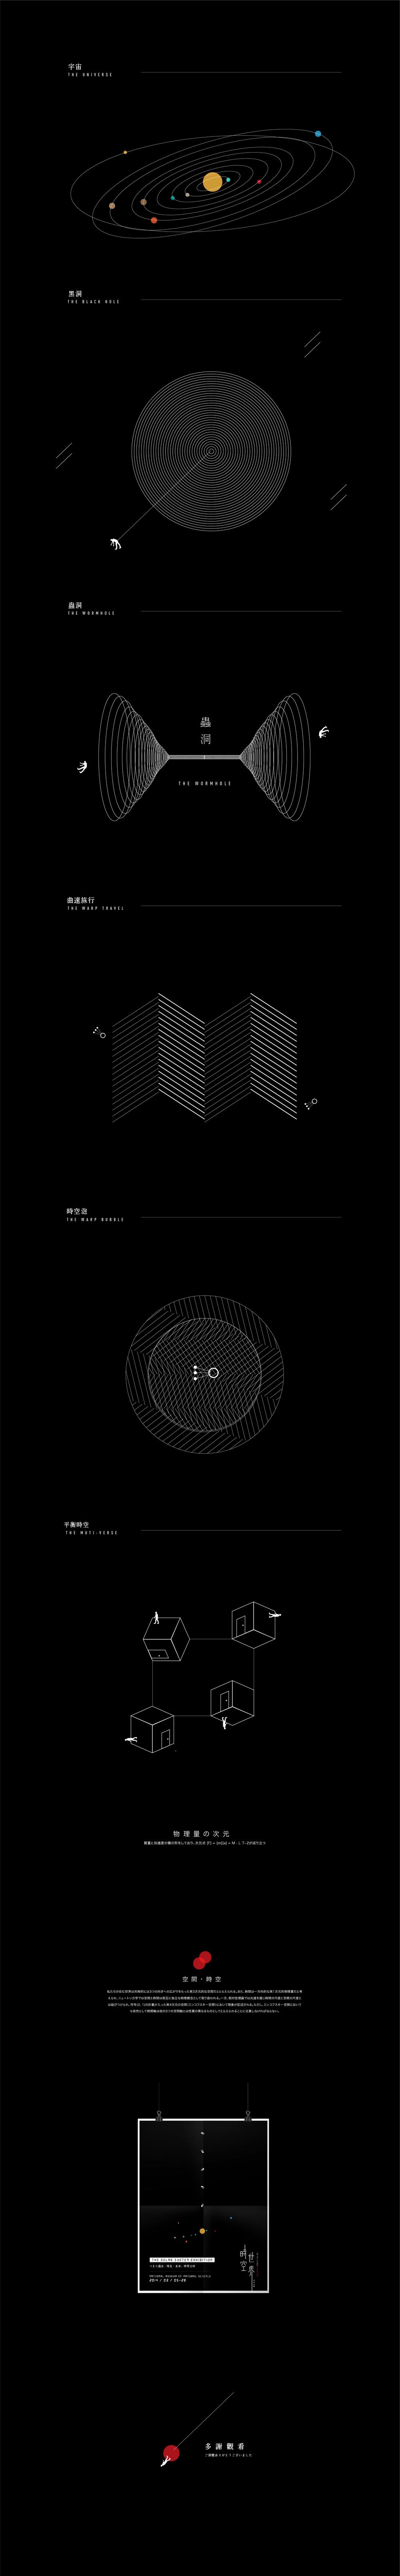 THE_UNIVERSE16s-04.jpg